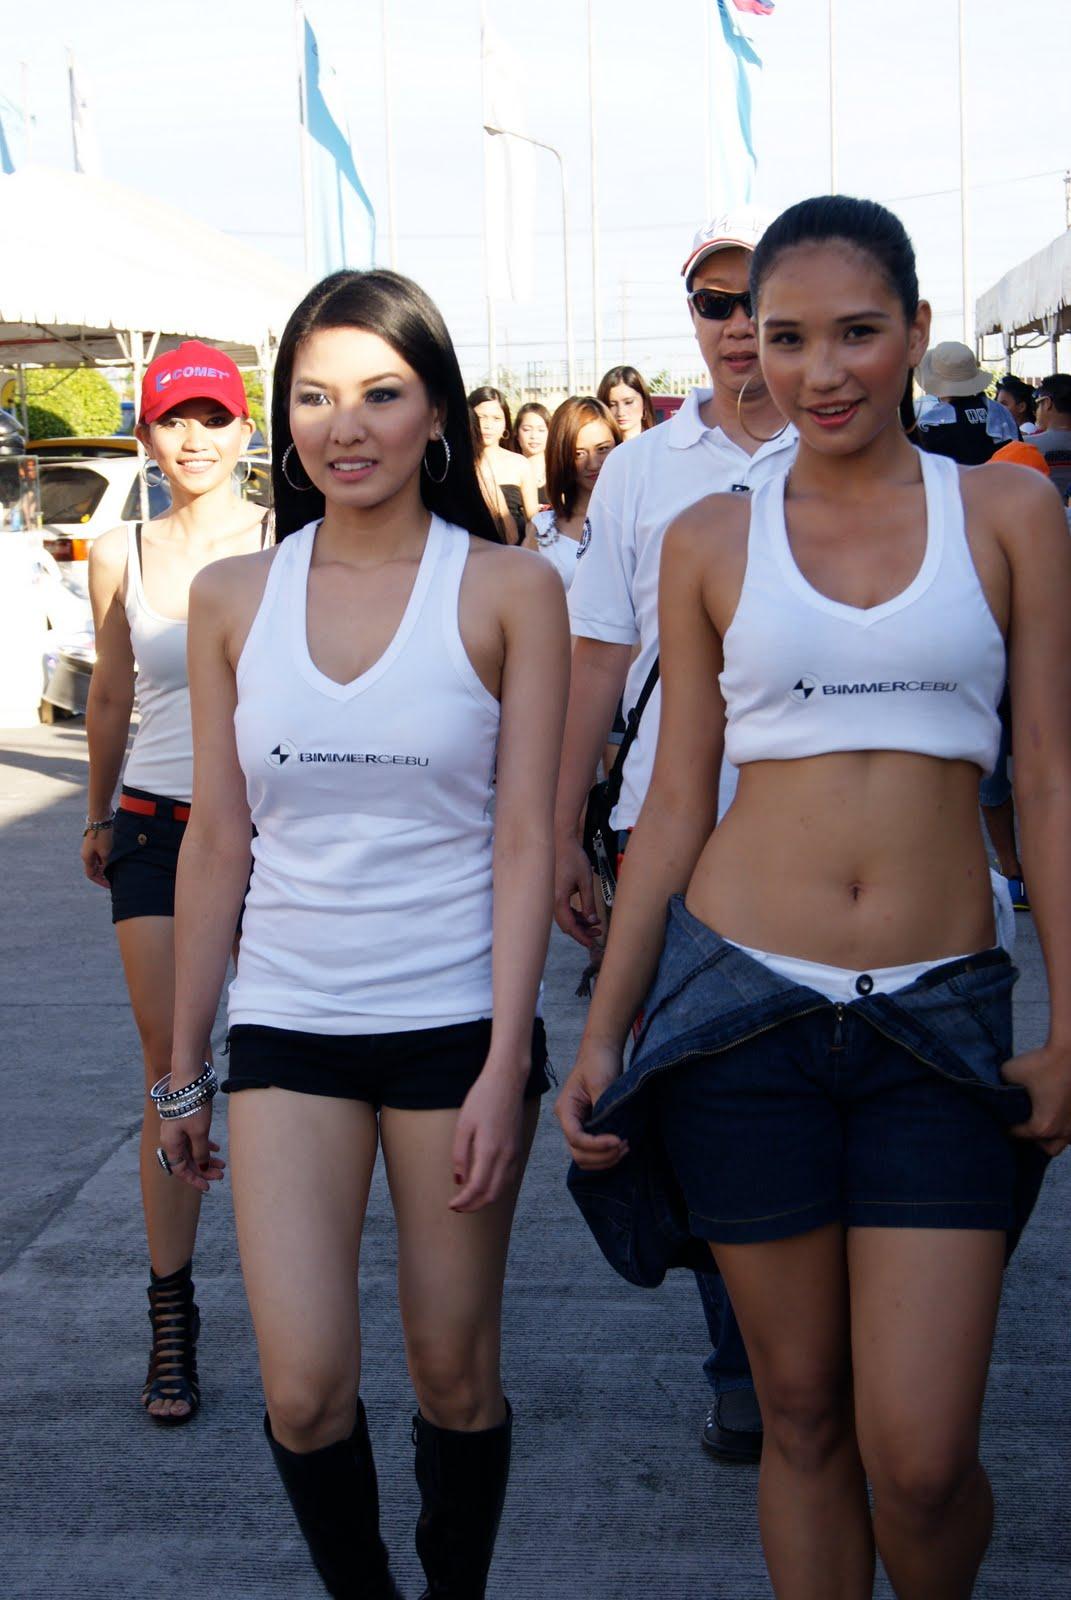 Cebu Tour Operators